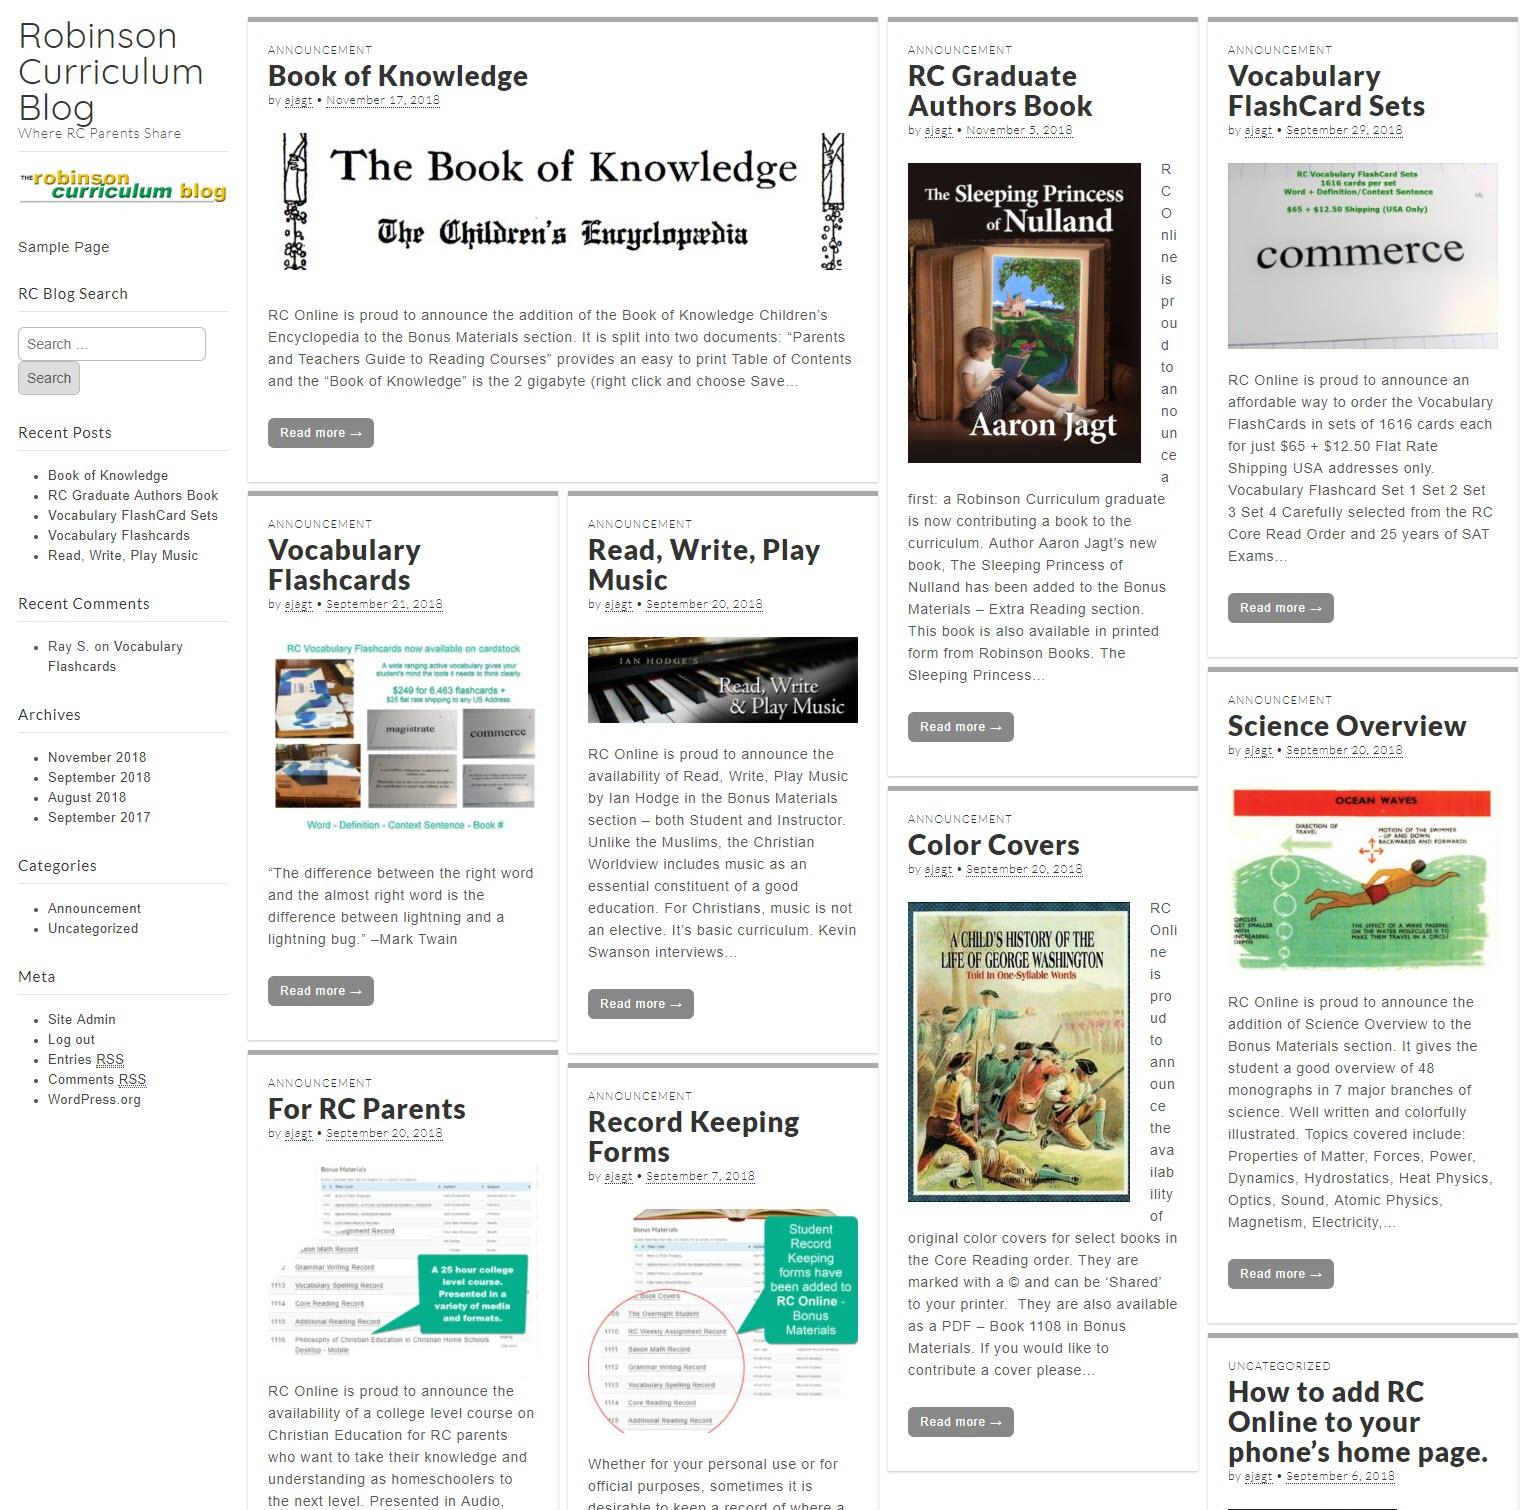 RC Online Blog